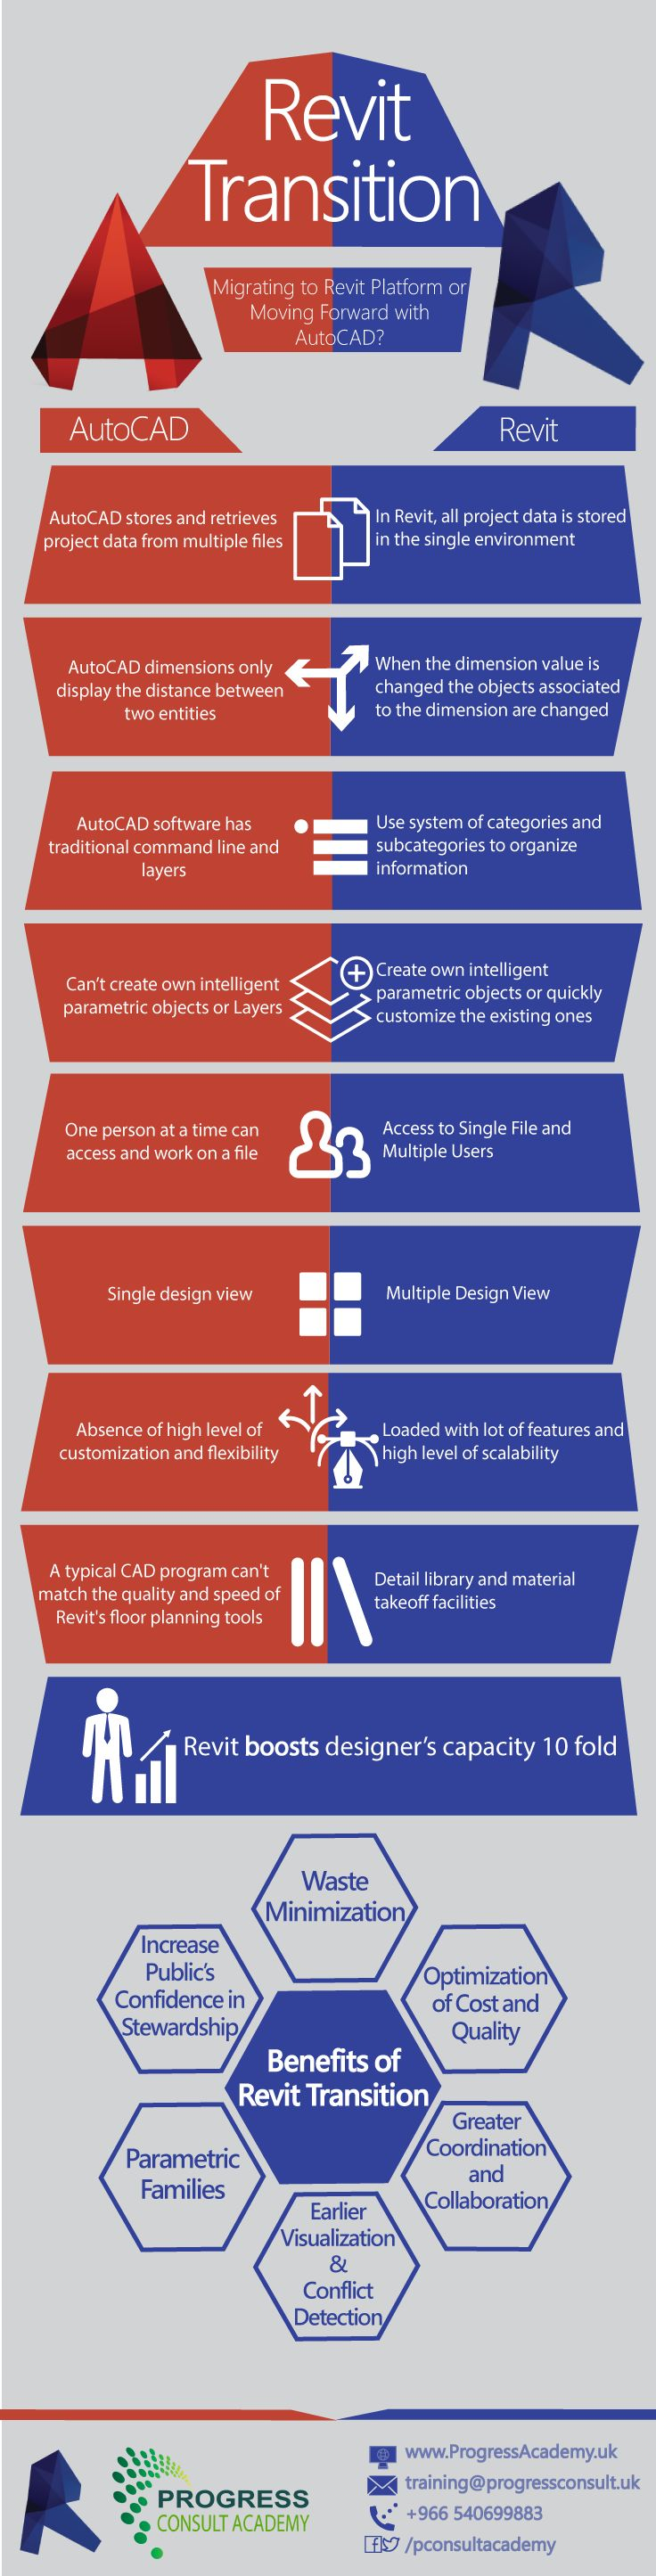 Autocad vs Revit  #Autocad #Revit  #Bim